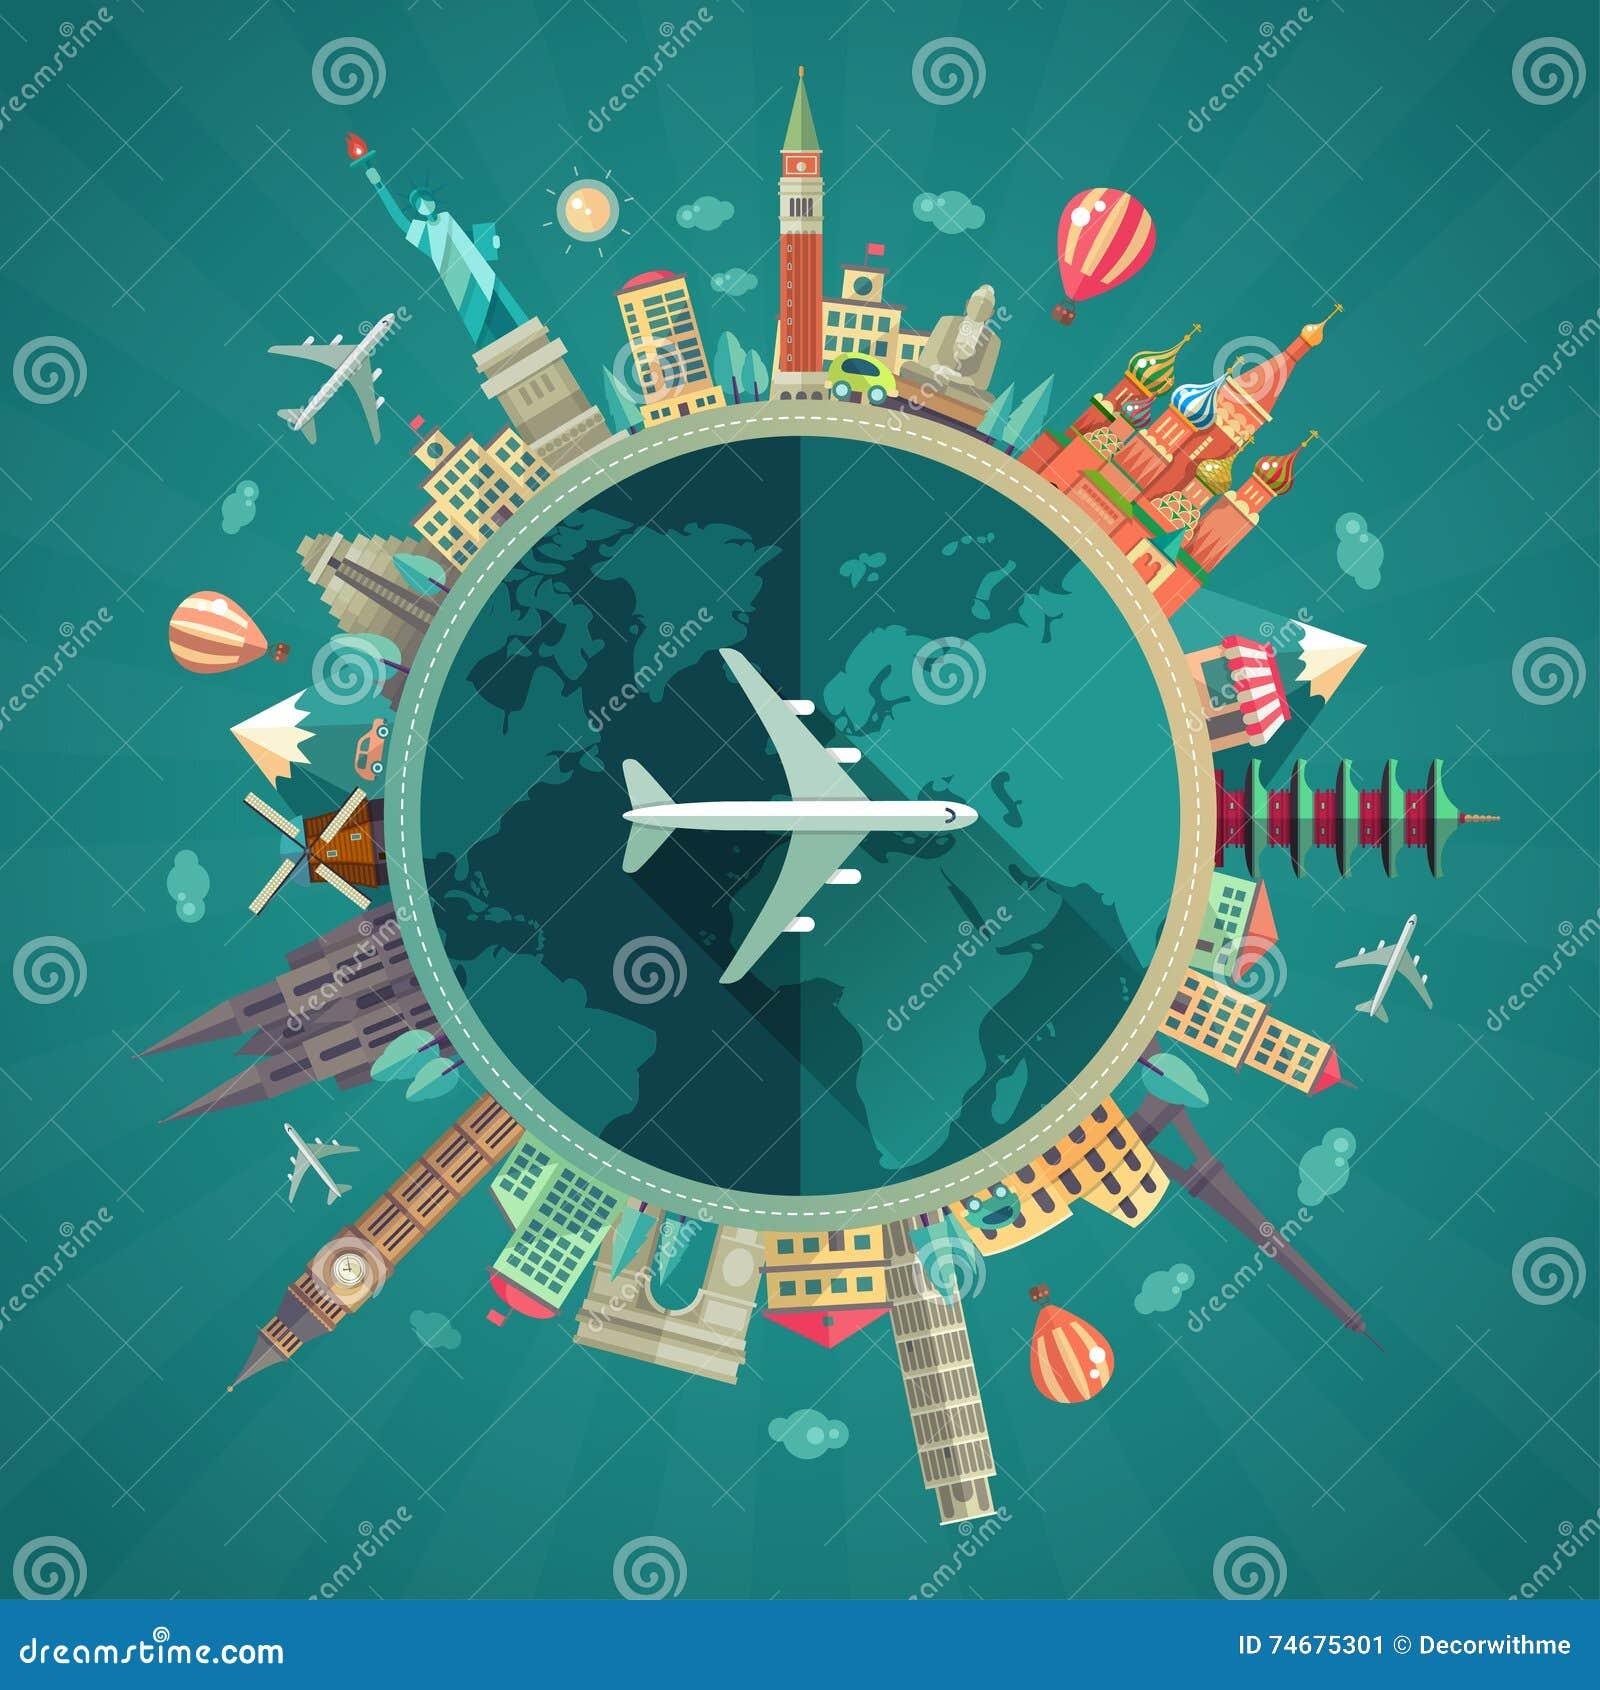 Travel around the world flat design illustration stock for Around the world cruise